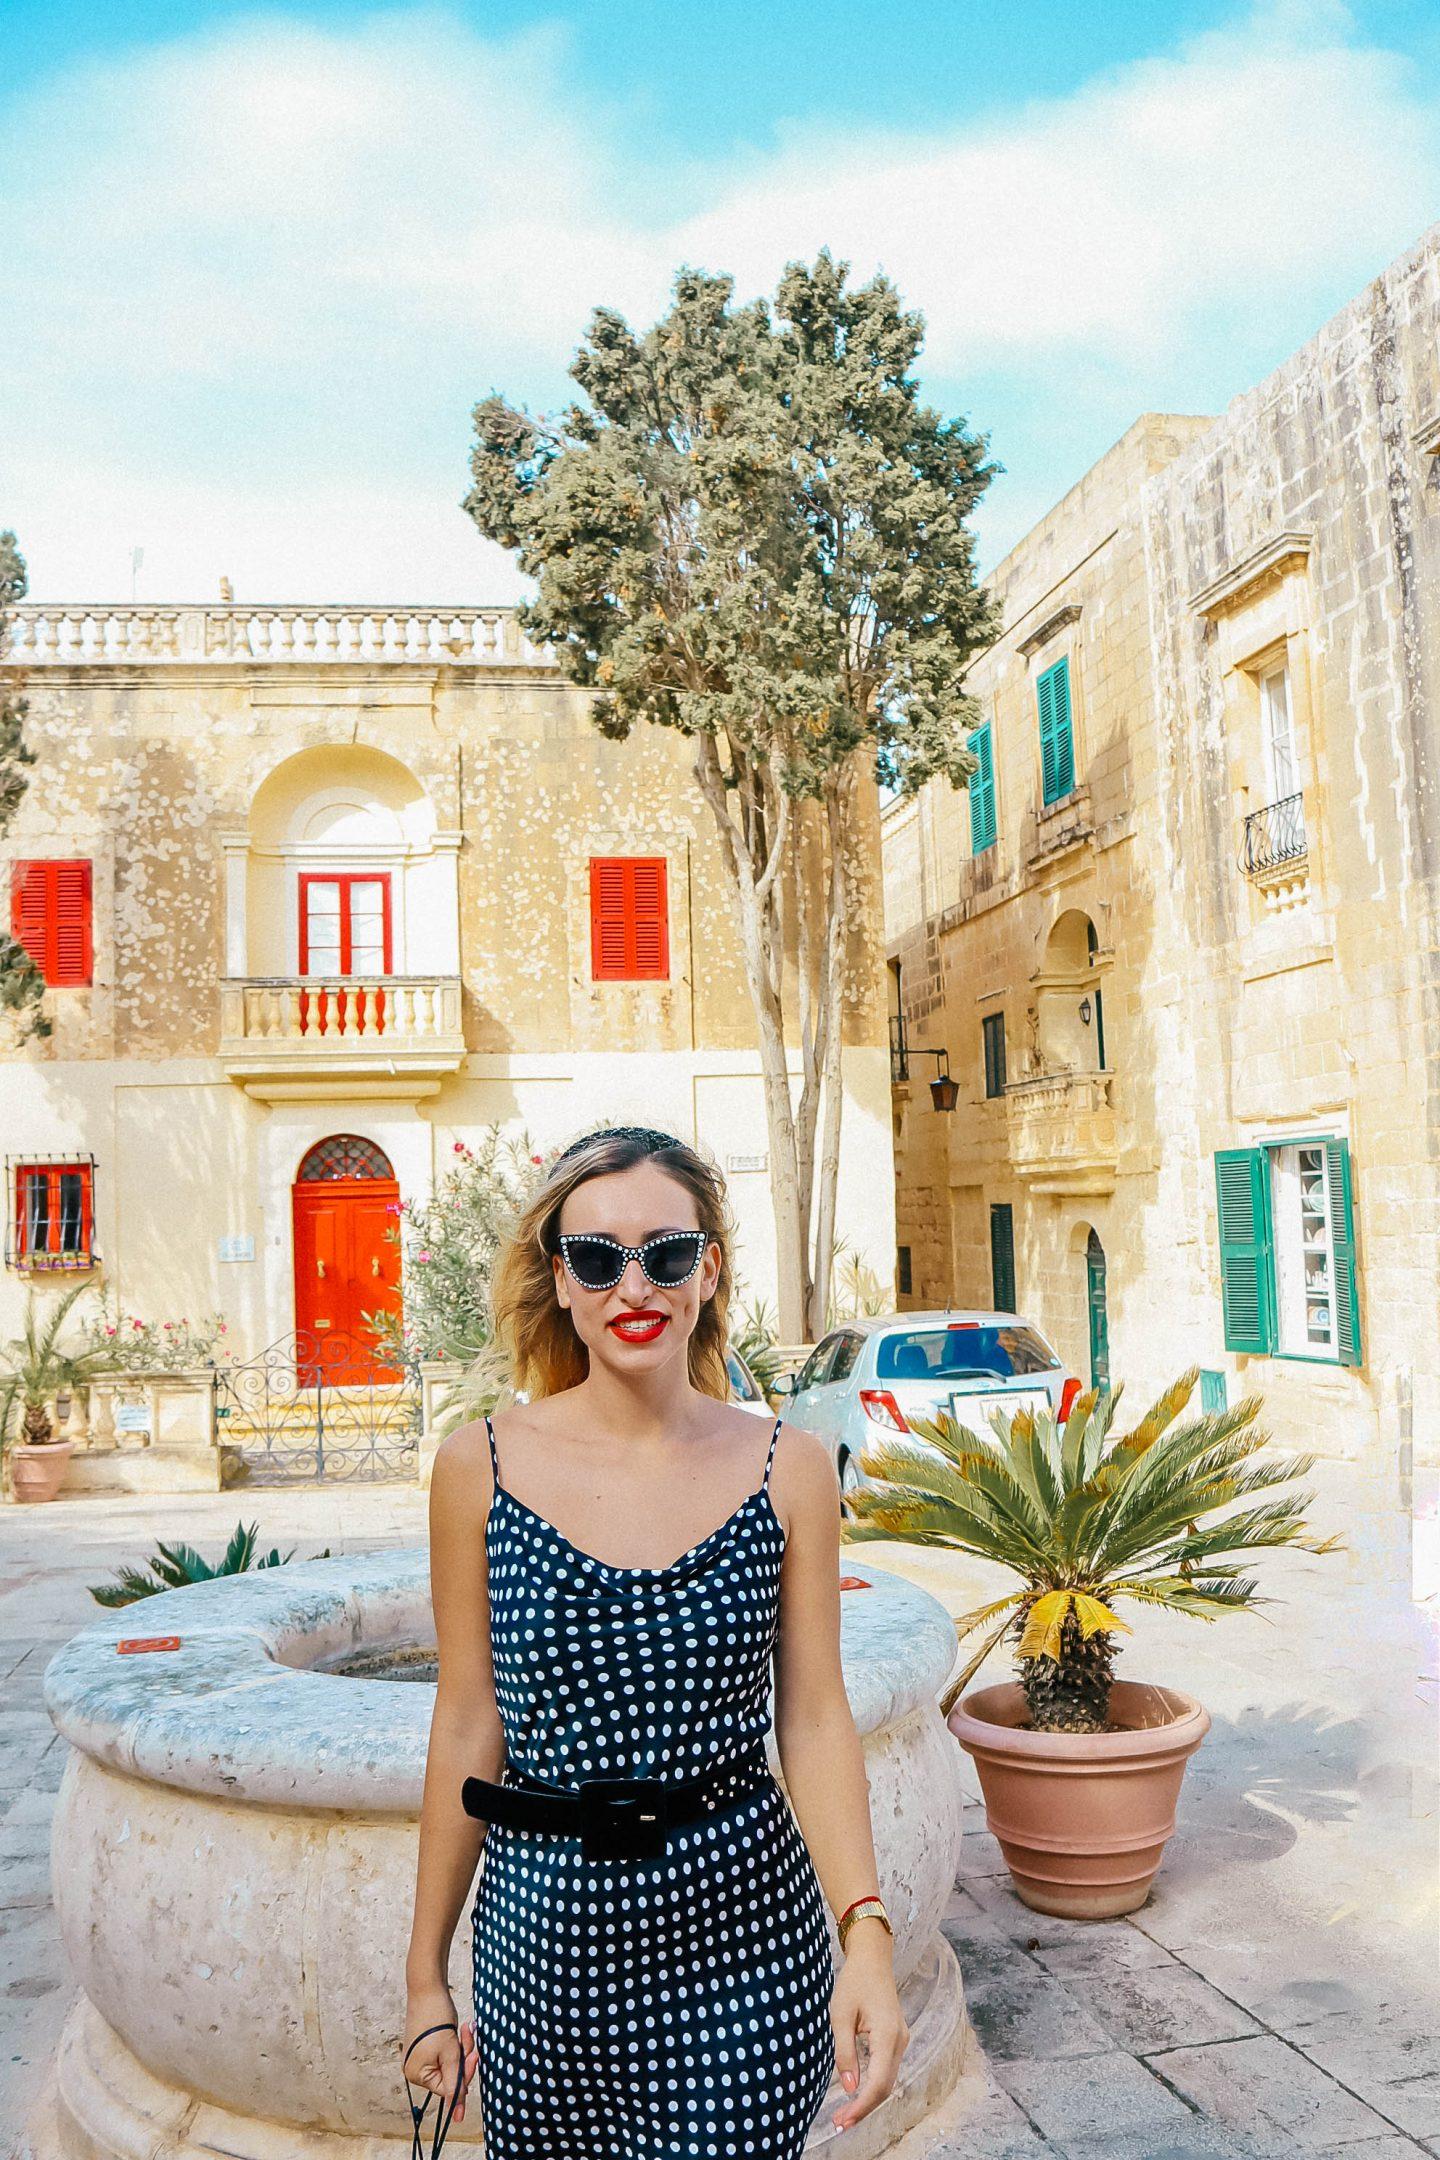 A trip to Malta & Gozo with Visit Malta